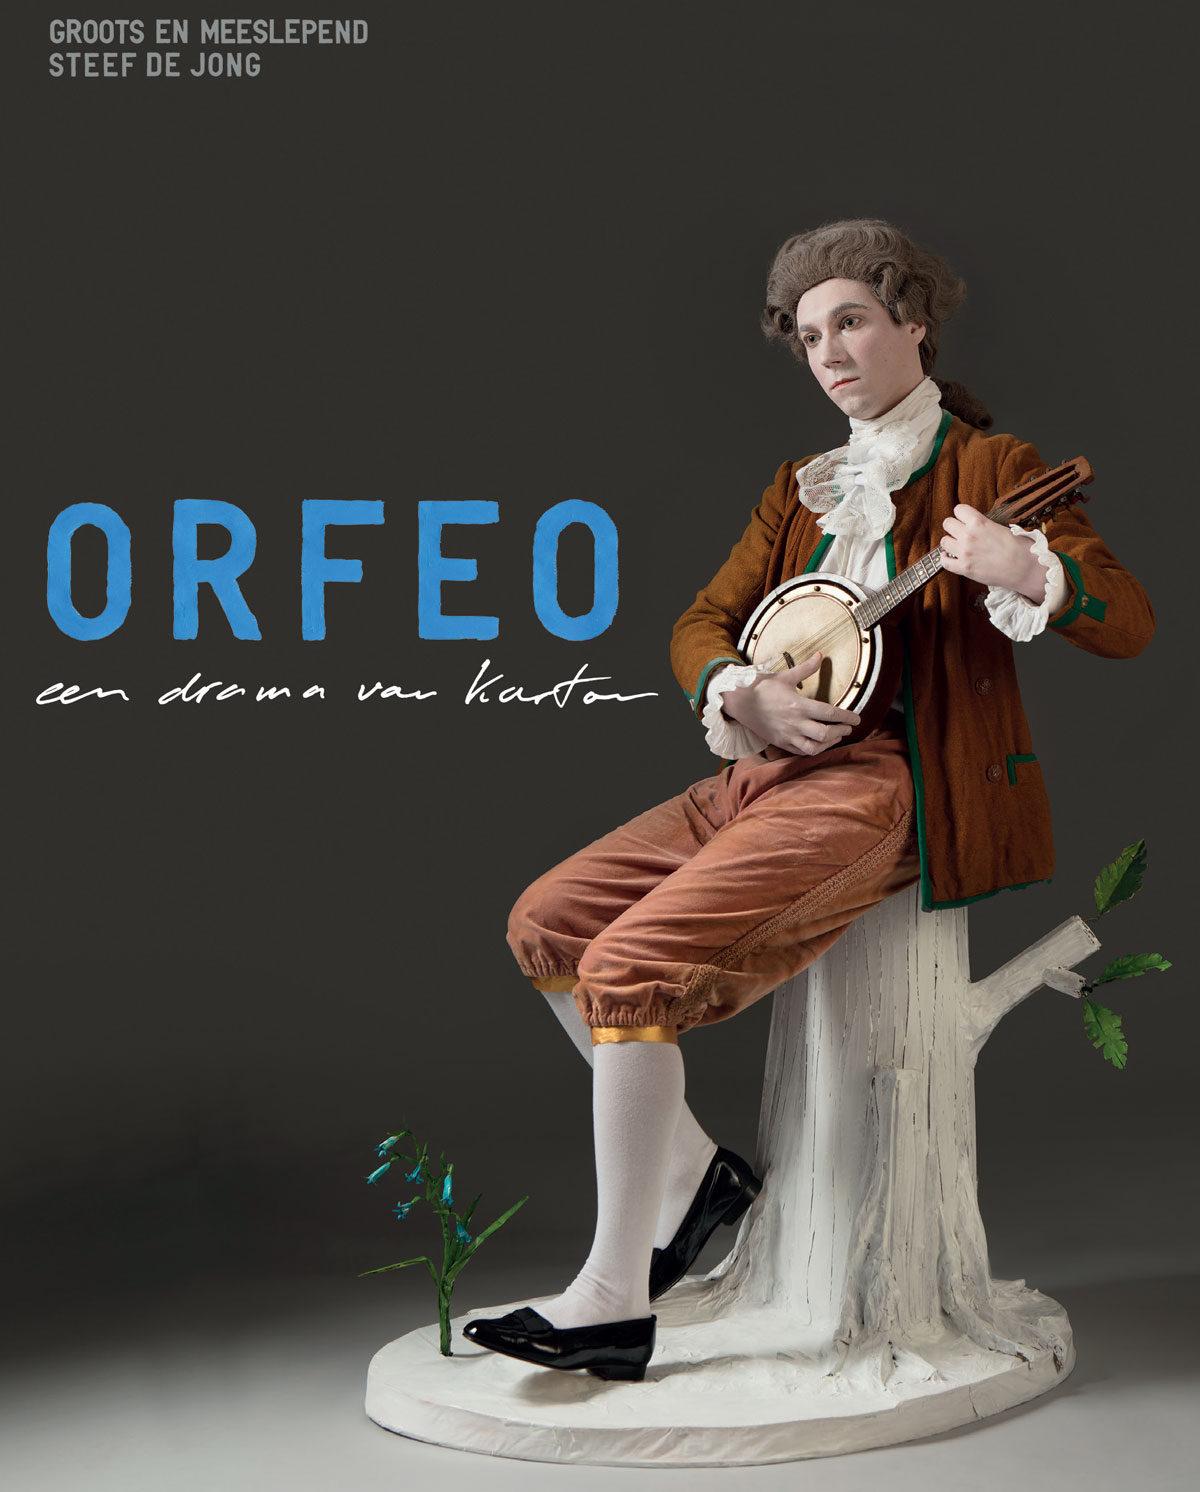 ORFEO, EEN DRAMA VAN KARTON